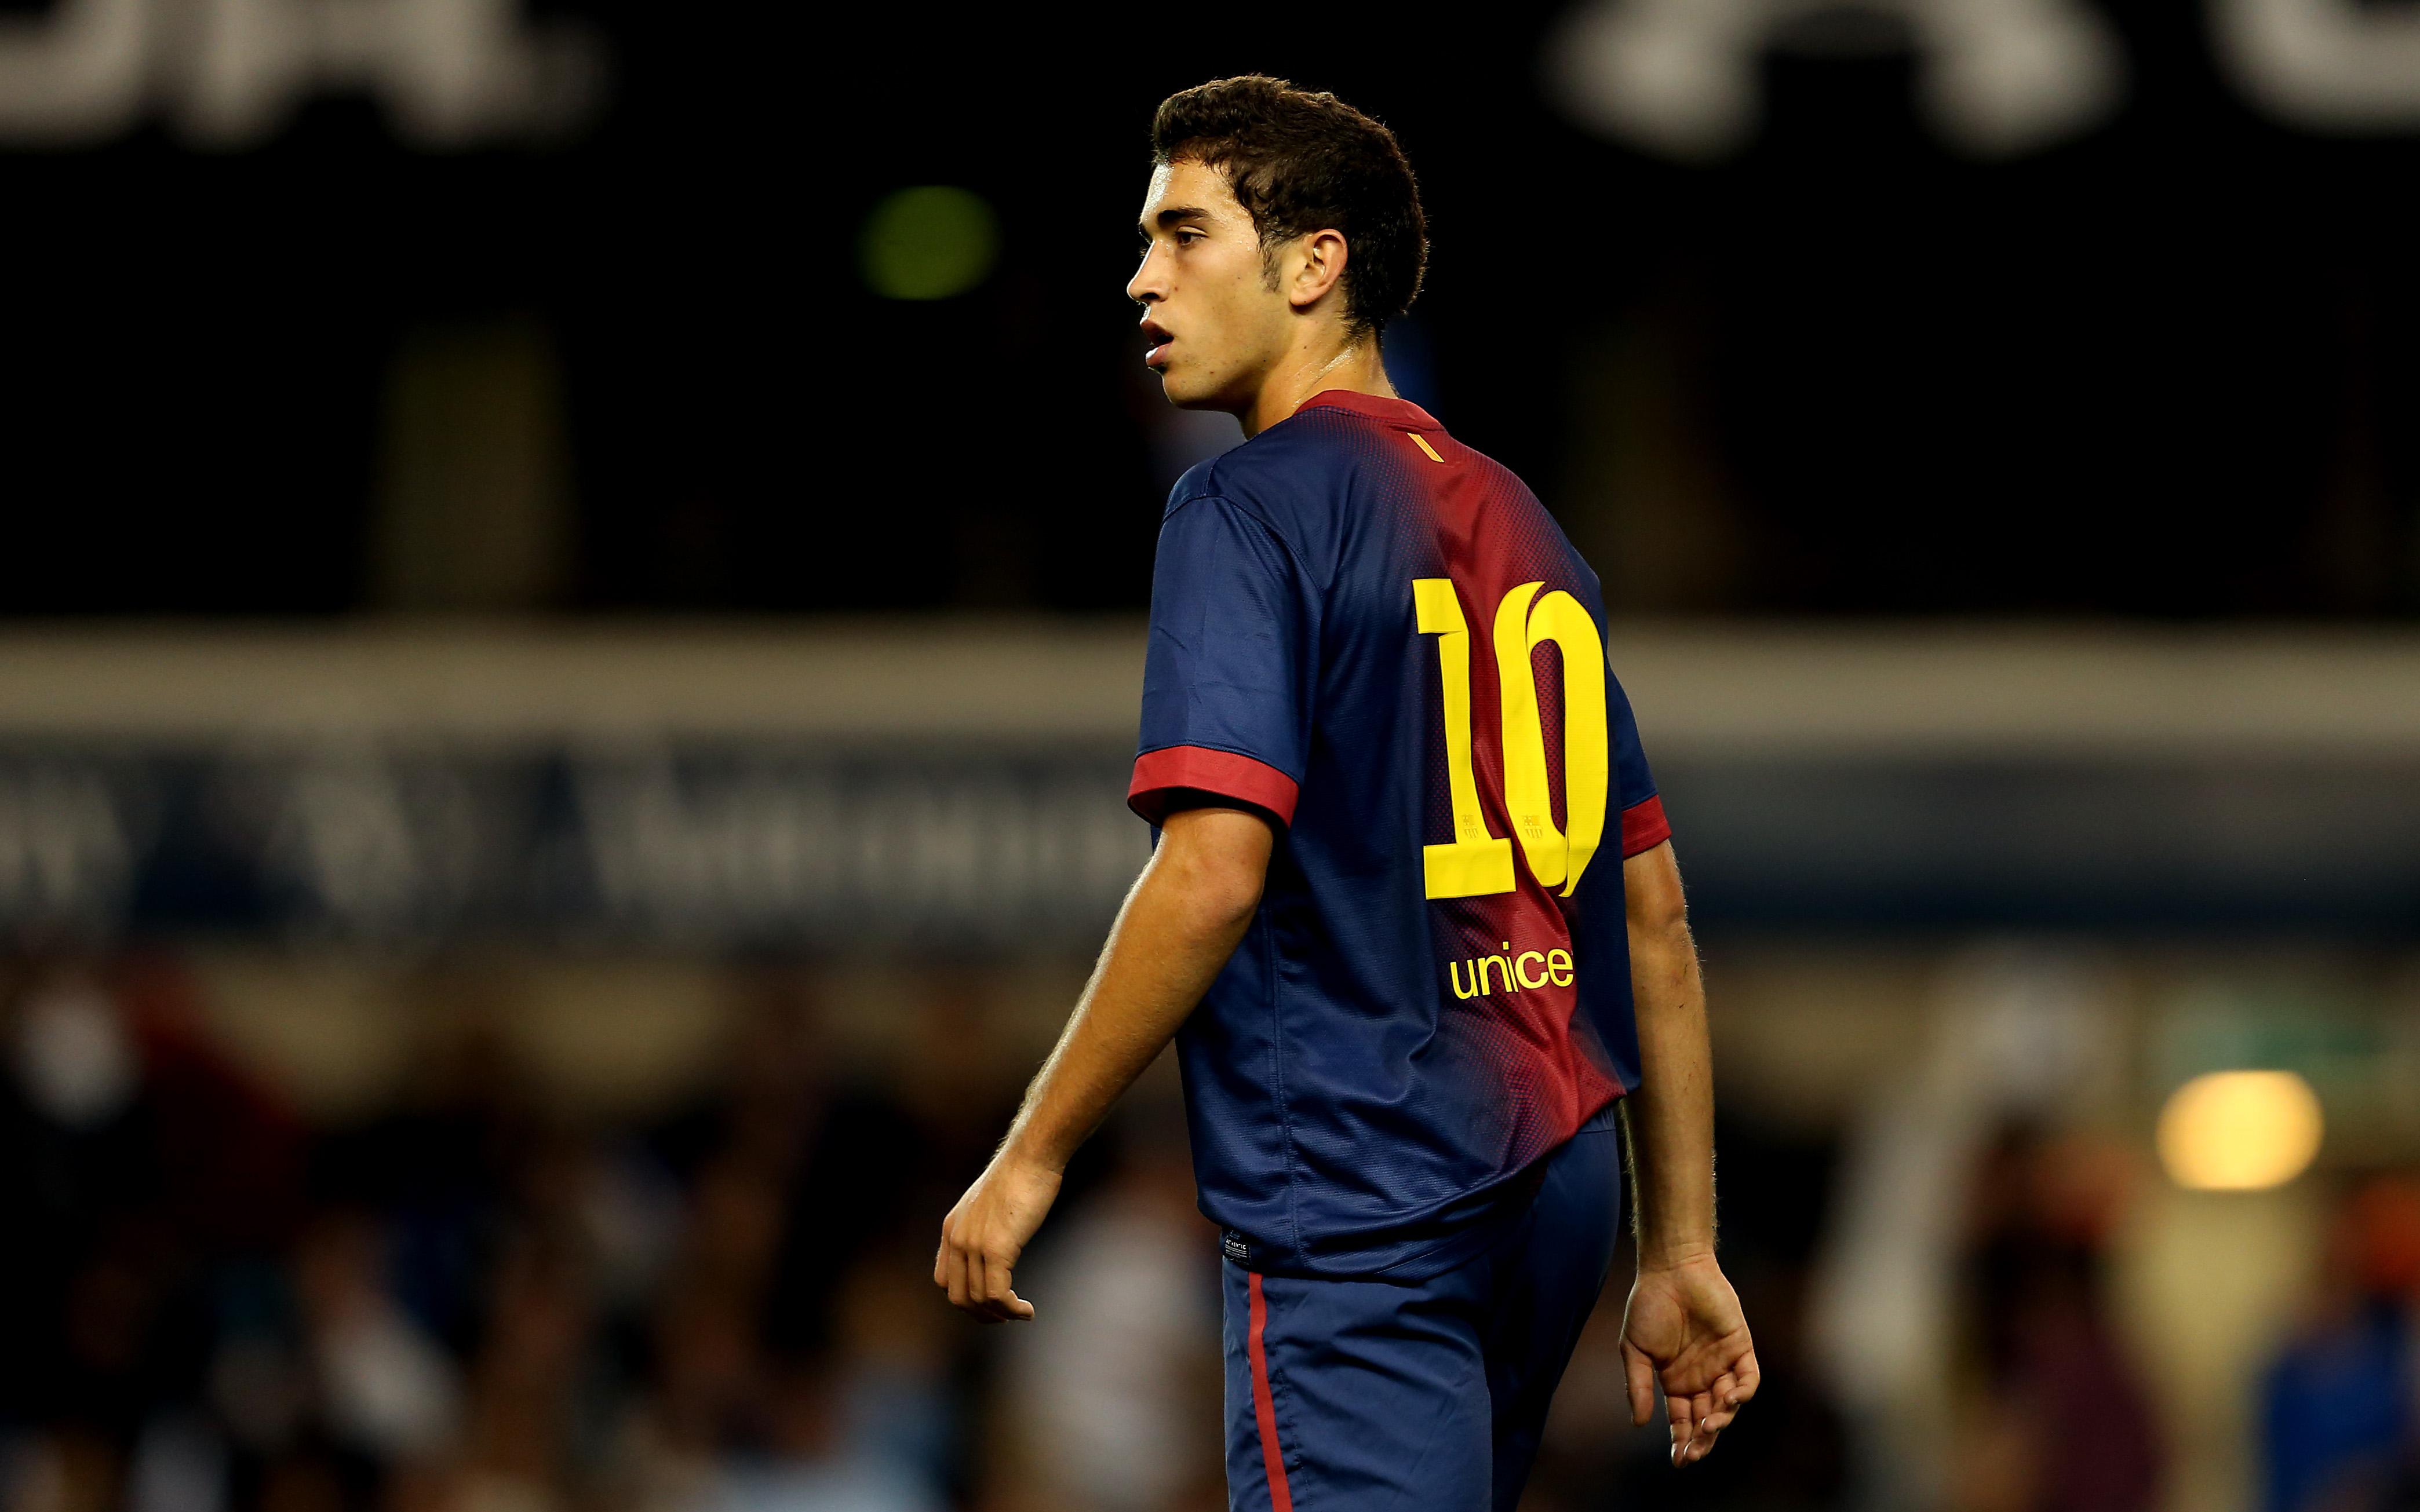 Soccer - The NextGen Series - Tottenham Hotspur U19 v Barcelona U19 - White Hart Lane